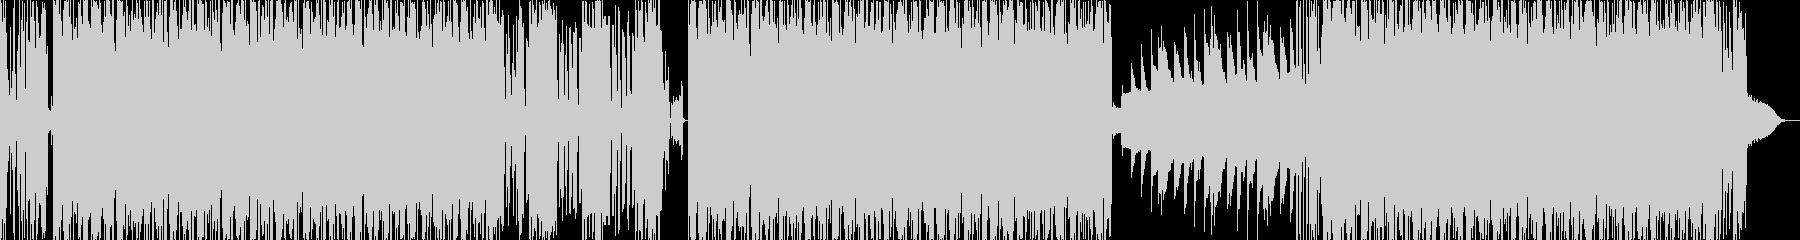 Funky, energetic,...'s unreproduced waveform